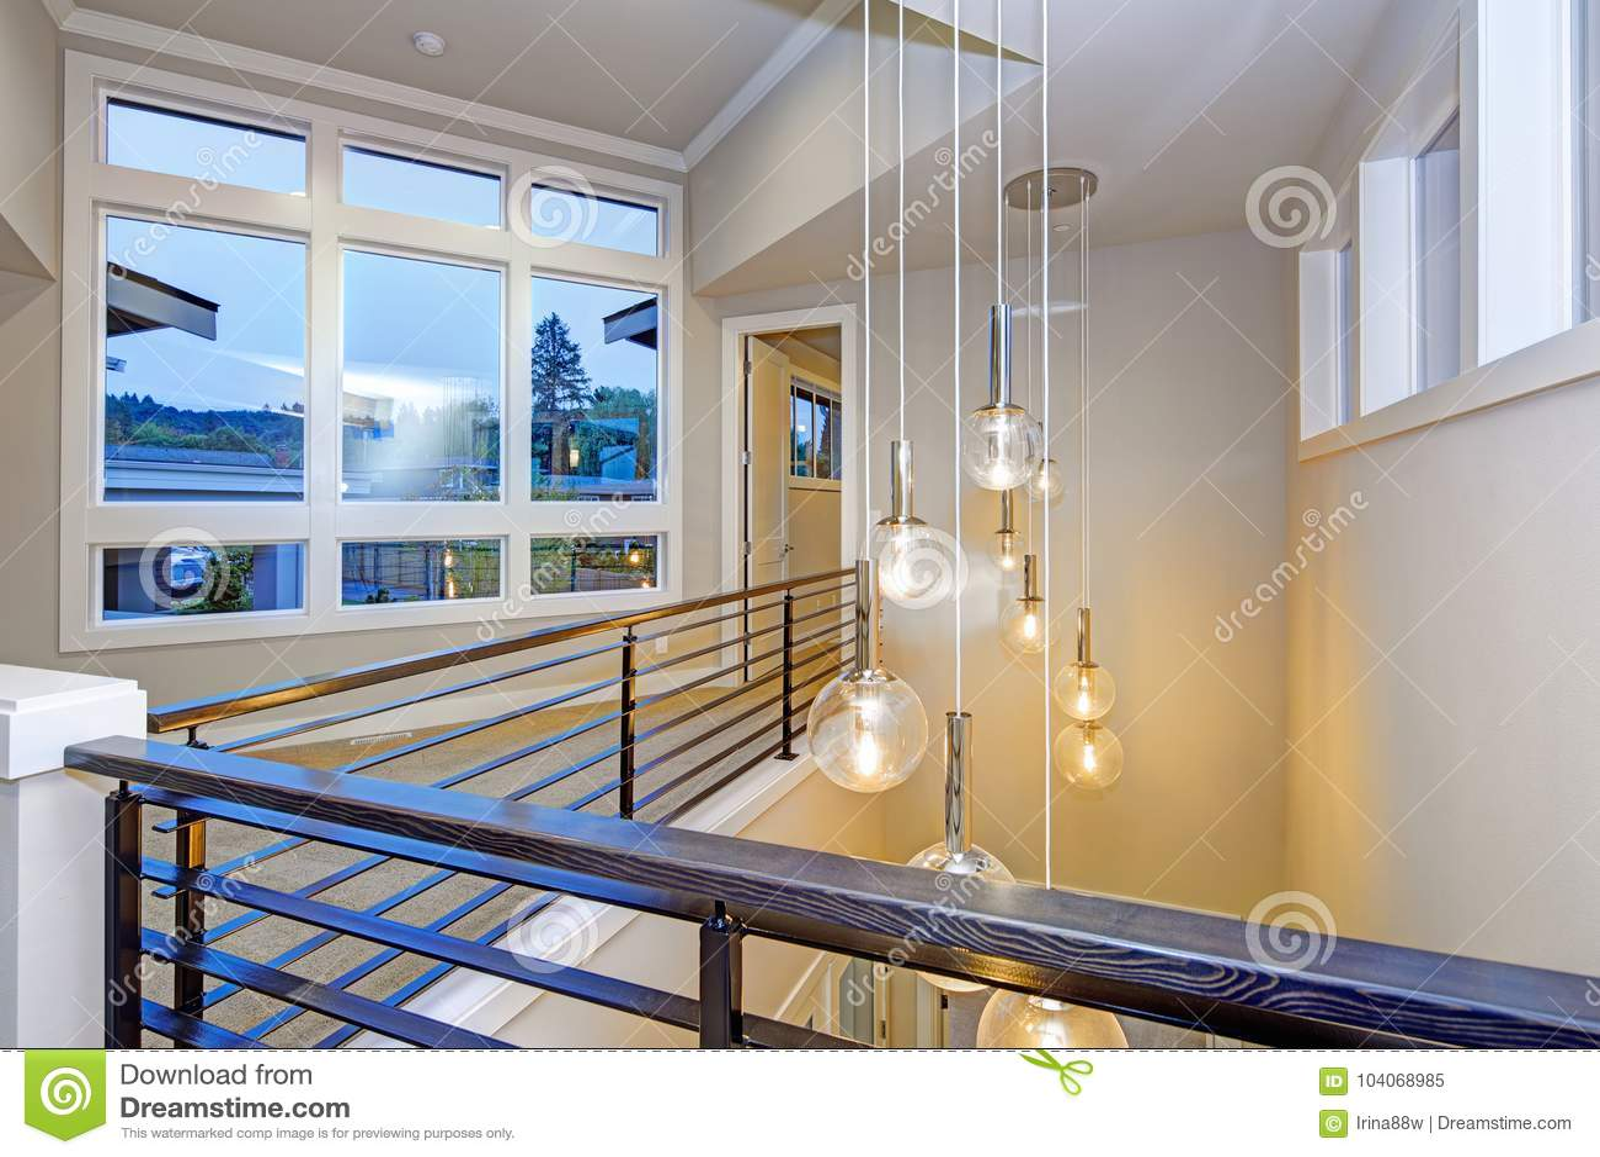 Second floor landing illuminated by beautiful chandelier